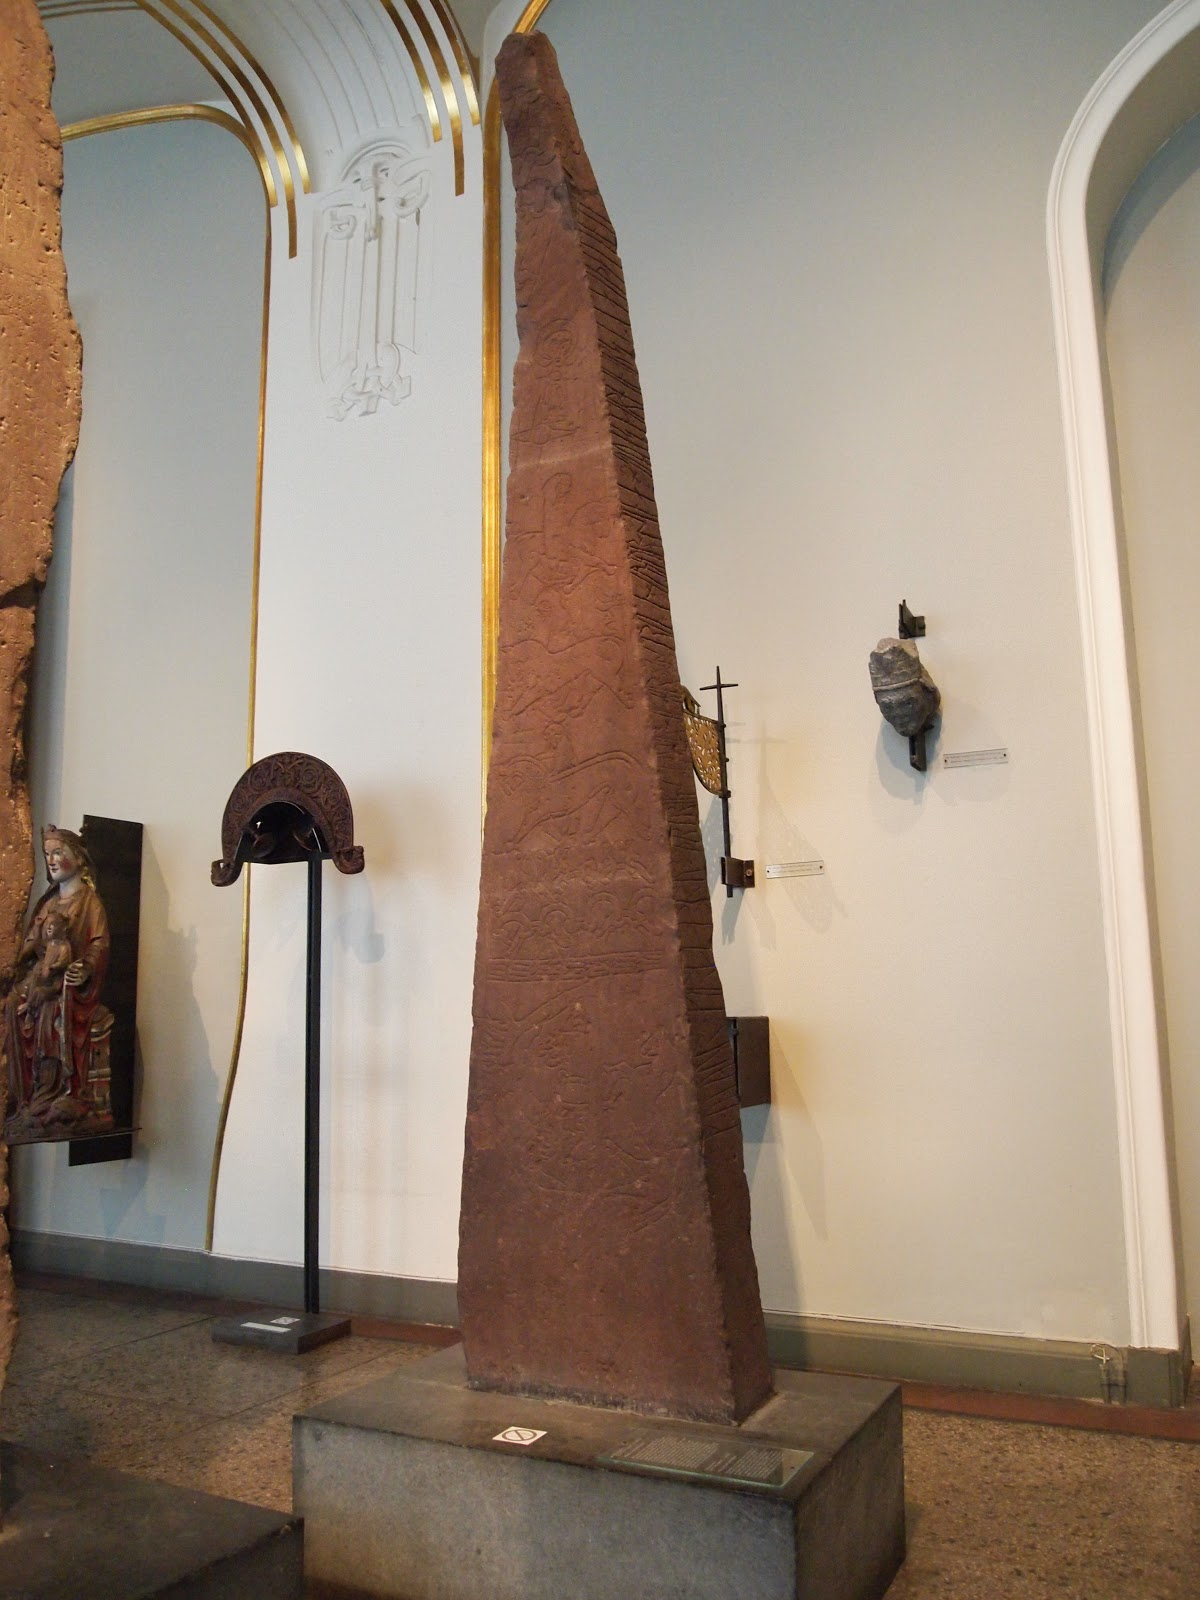 k a n kvinner i arkeologi i norge ylivieska